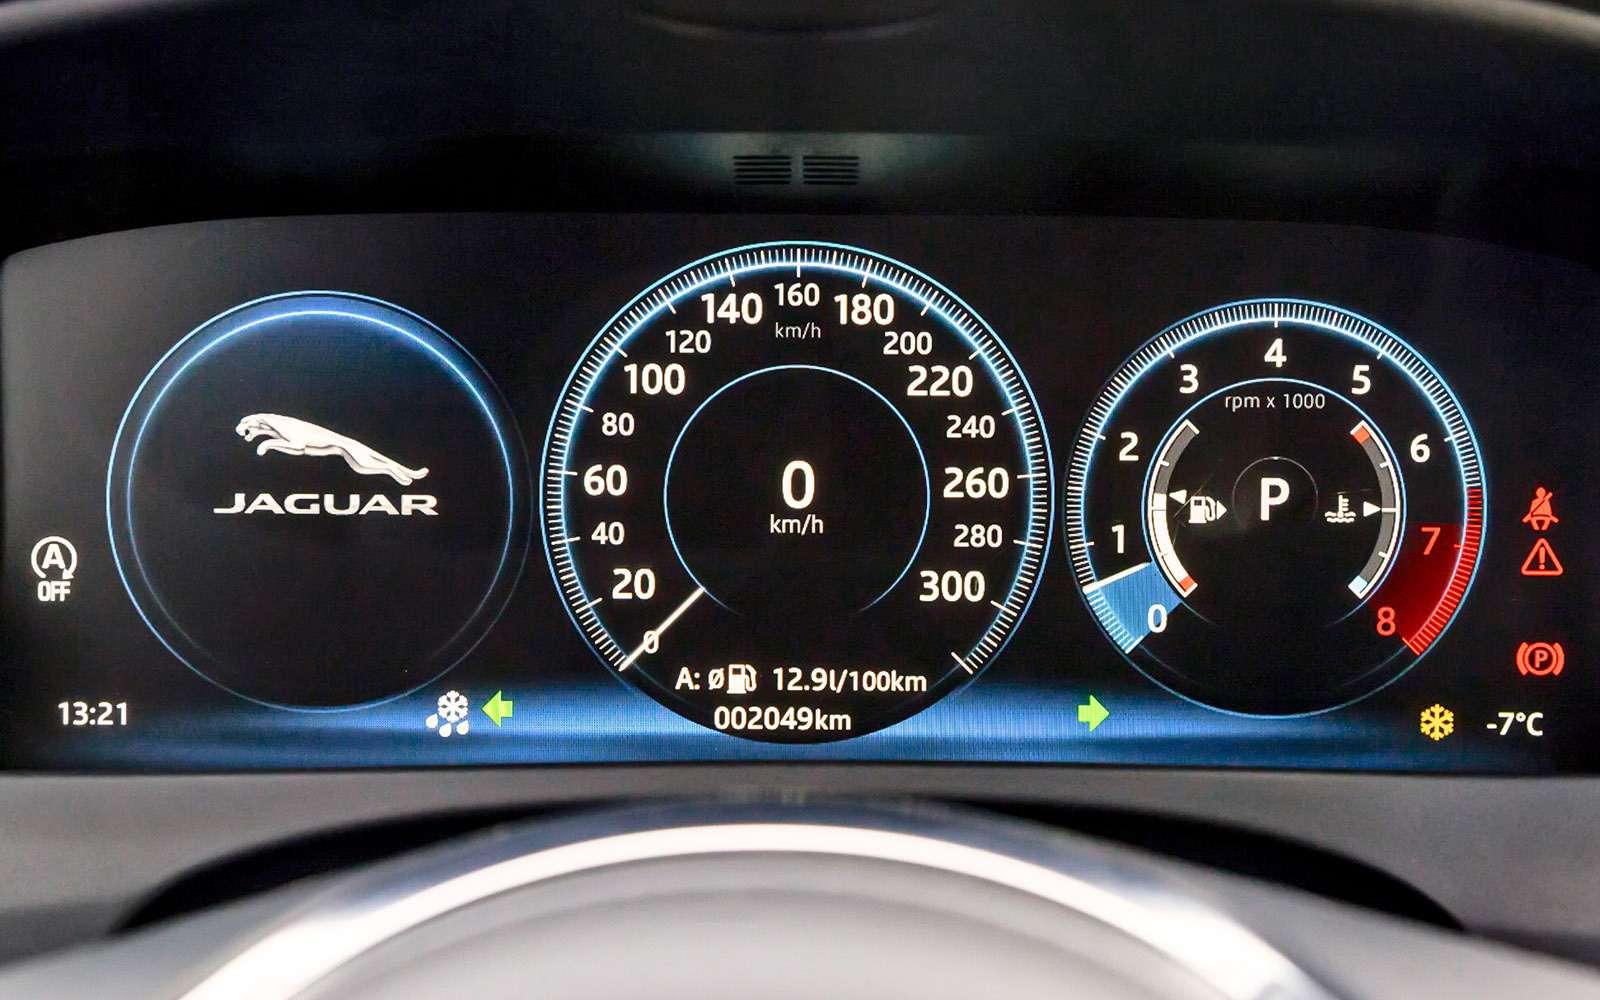 Тест премиум-кроссоверов: Lexus RX350, Cadillac XT5и Jaguar F-Pace— фото 721759